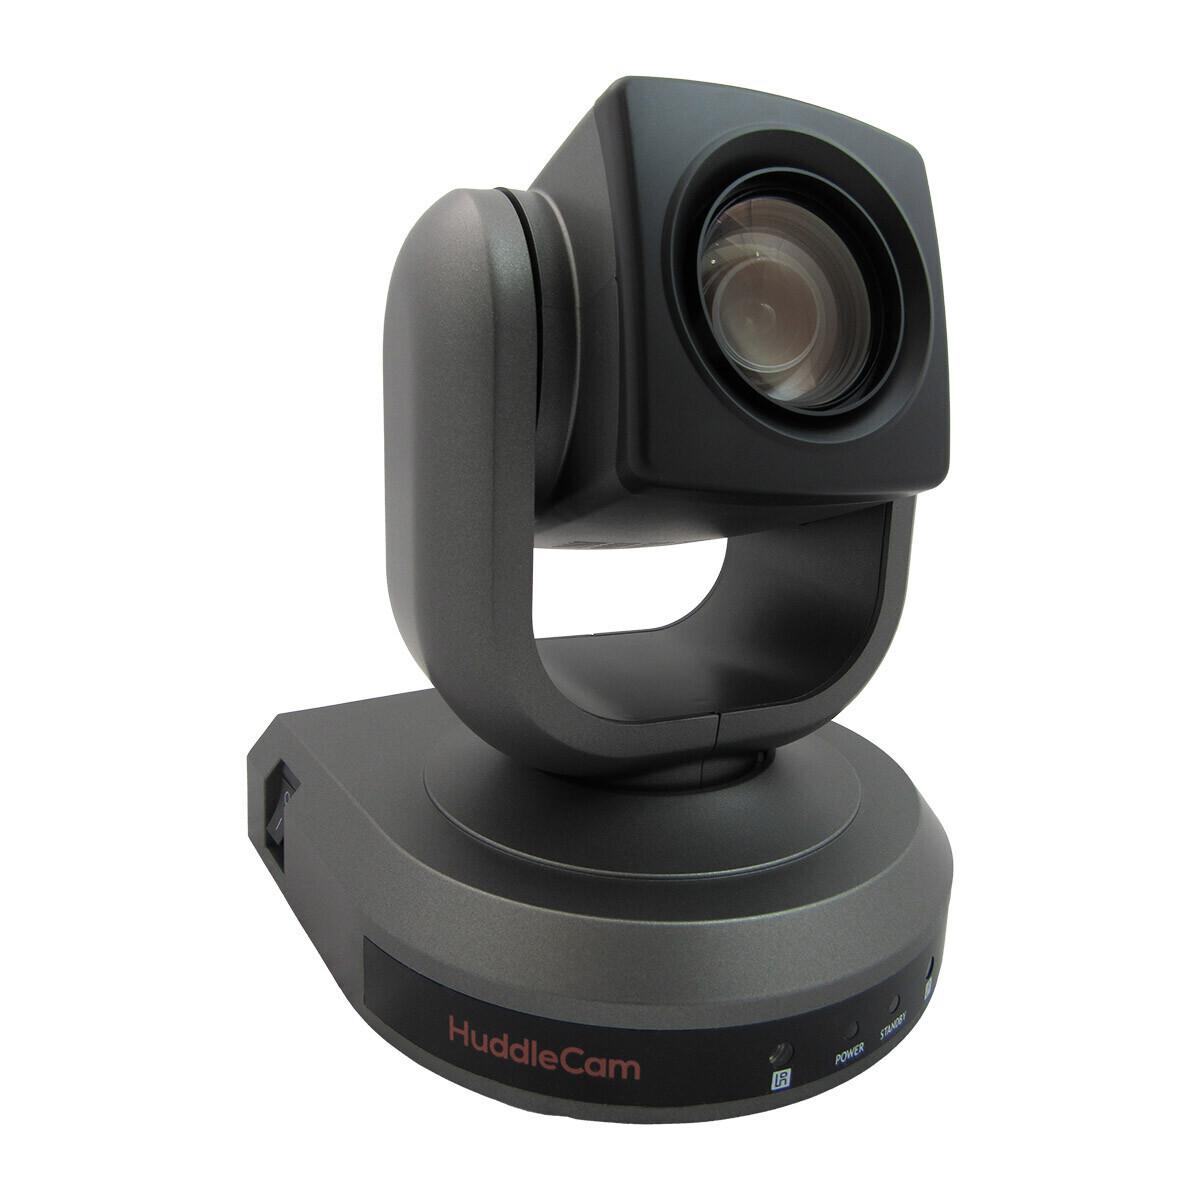 HuddleCamHD HC20X-GY-G2-C PTZ Kamera, grau